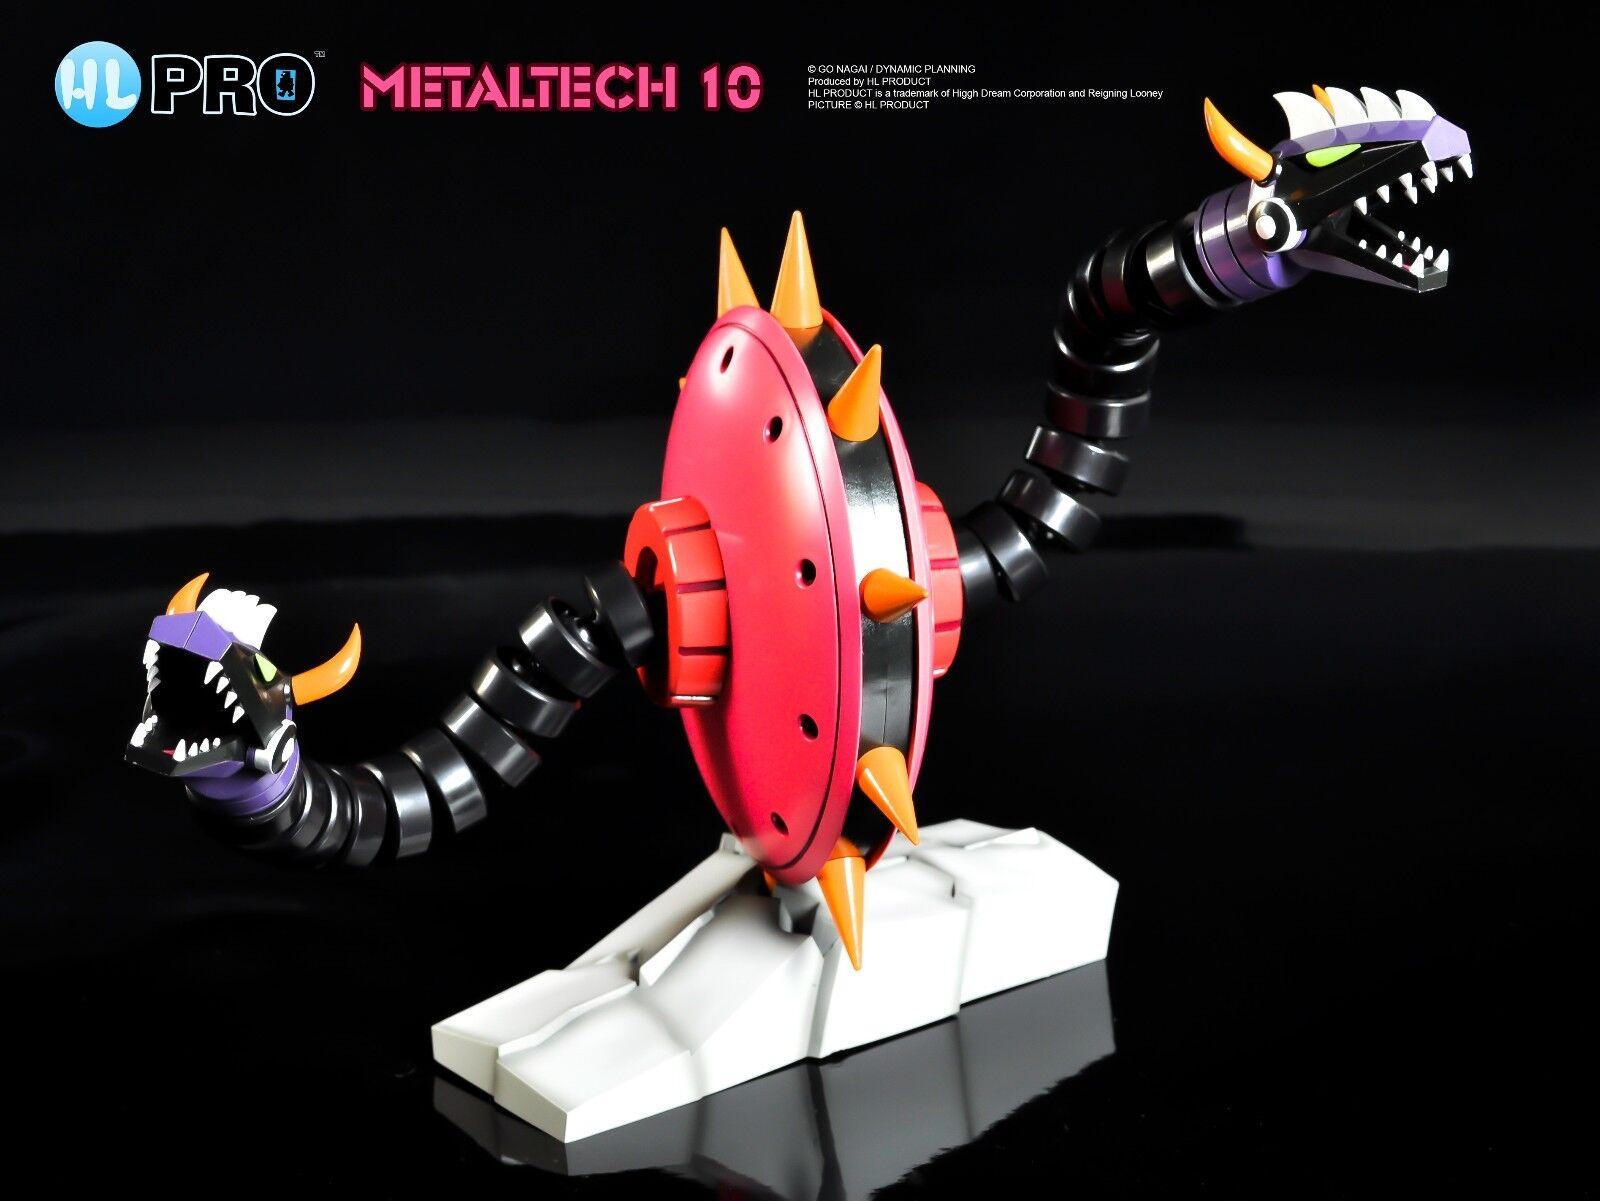 HL PRO METALTECH 10 GORU GORU from UFO ROBOT GRENDIZER goldRAKE 38cm NEW